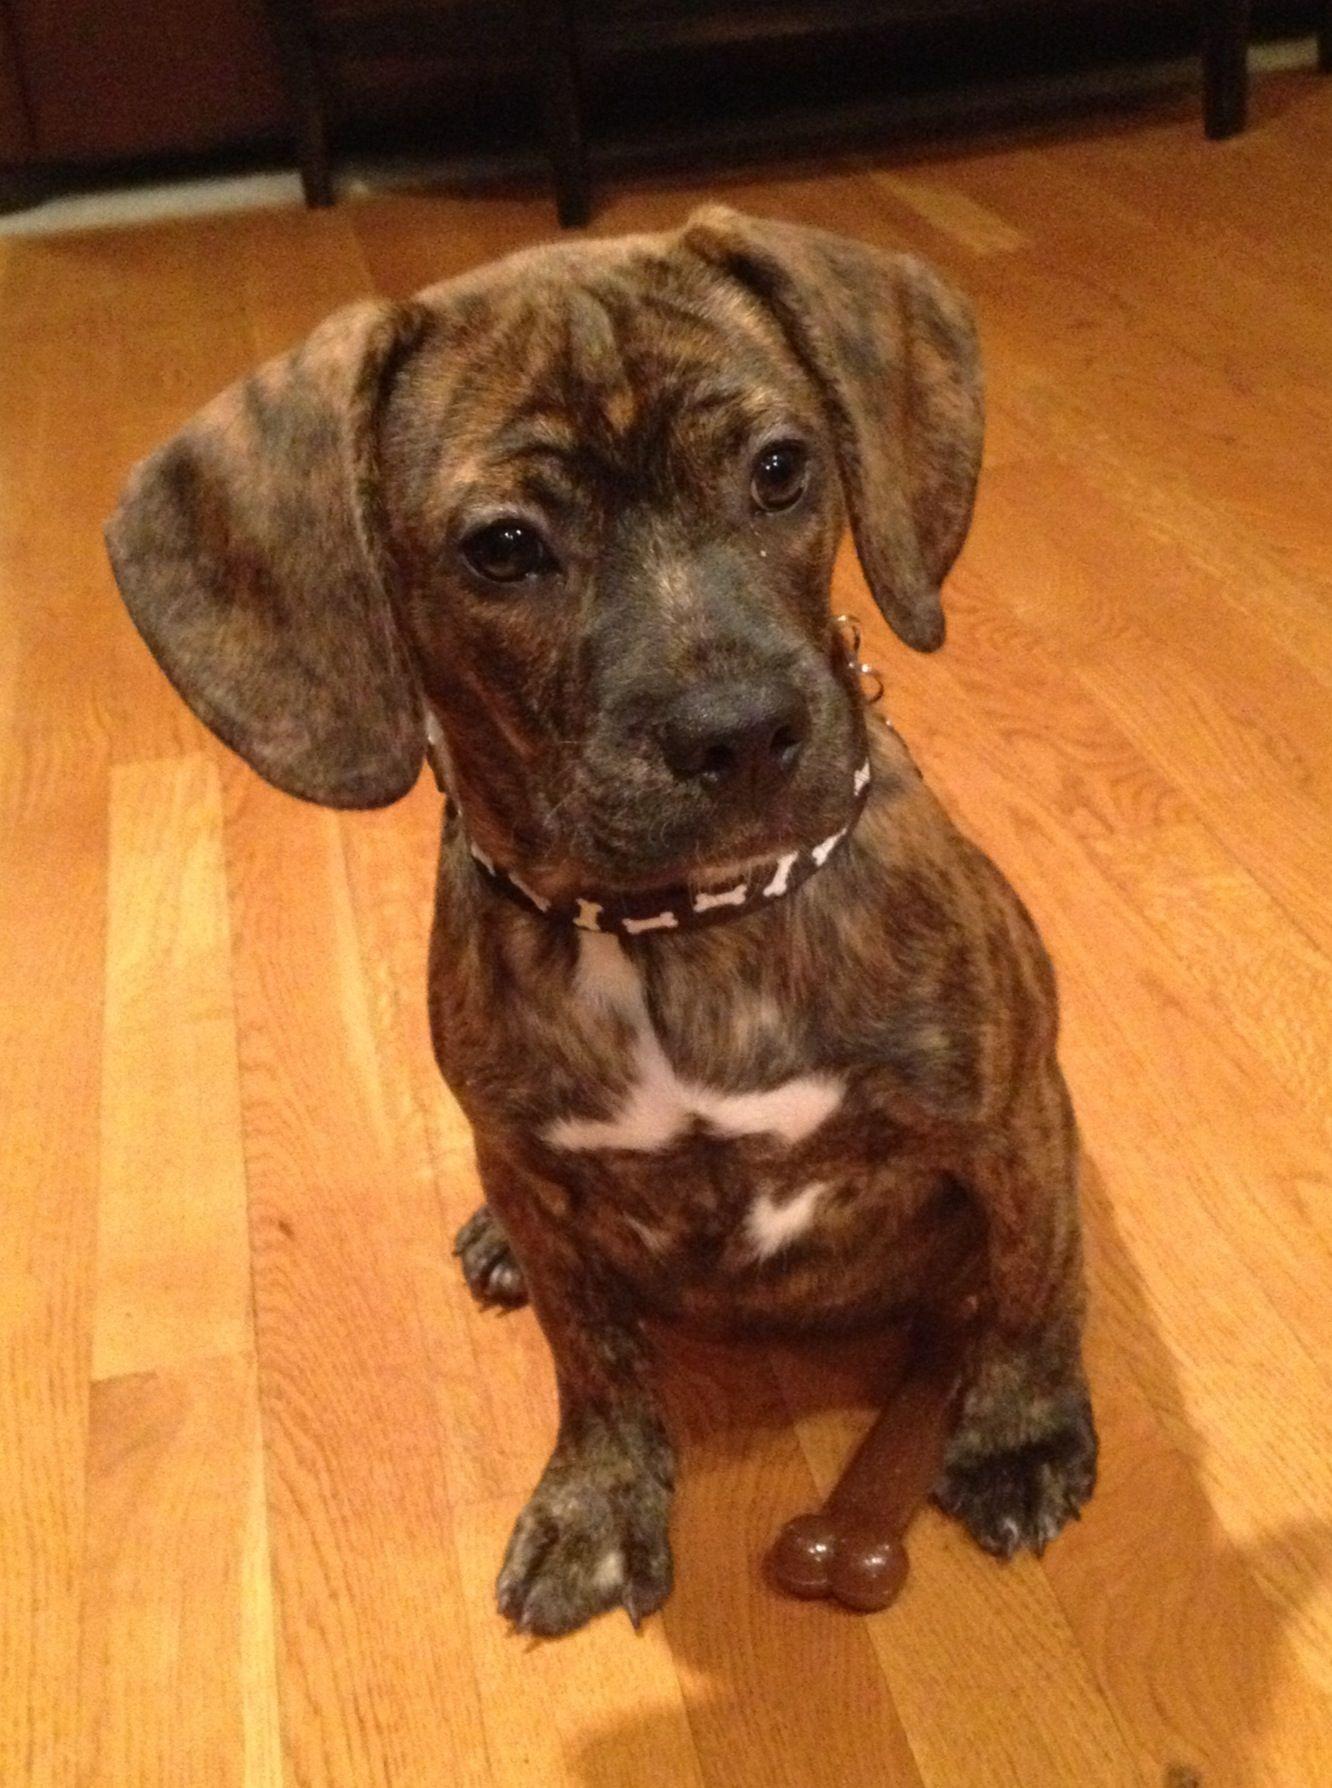 Our Frengle Puppy Hybrid Mix Half French Bulldog Half Beagle